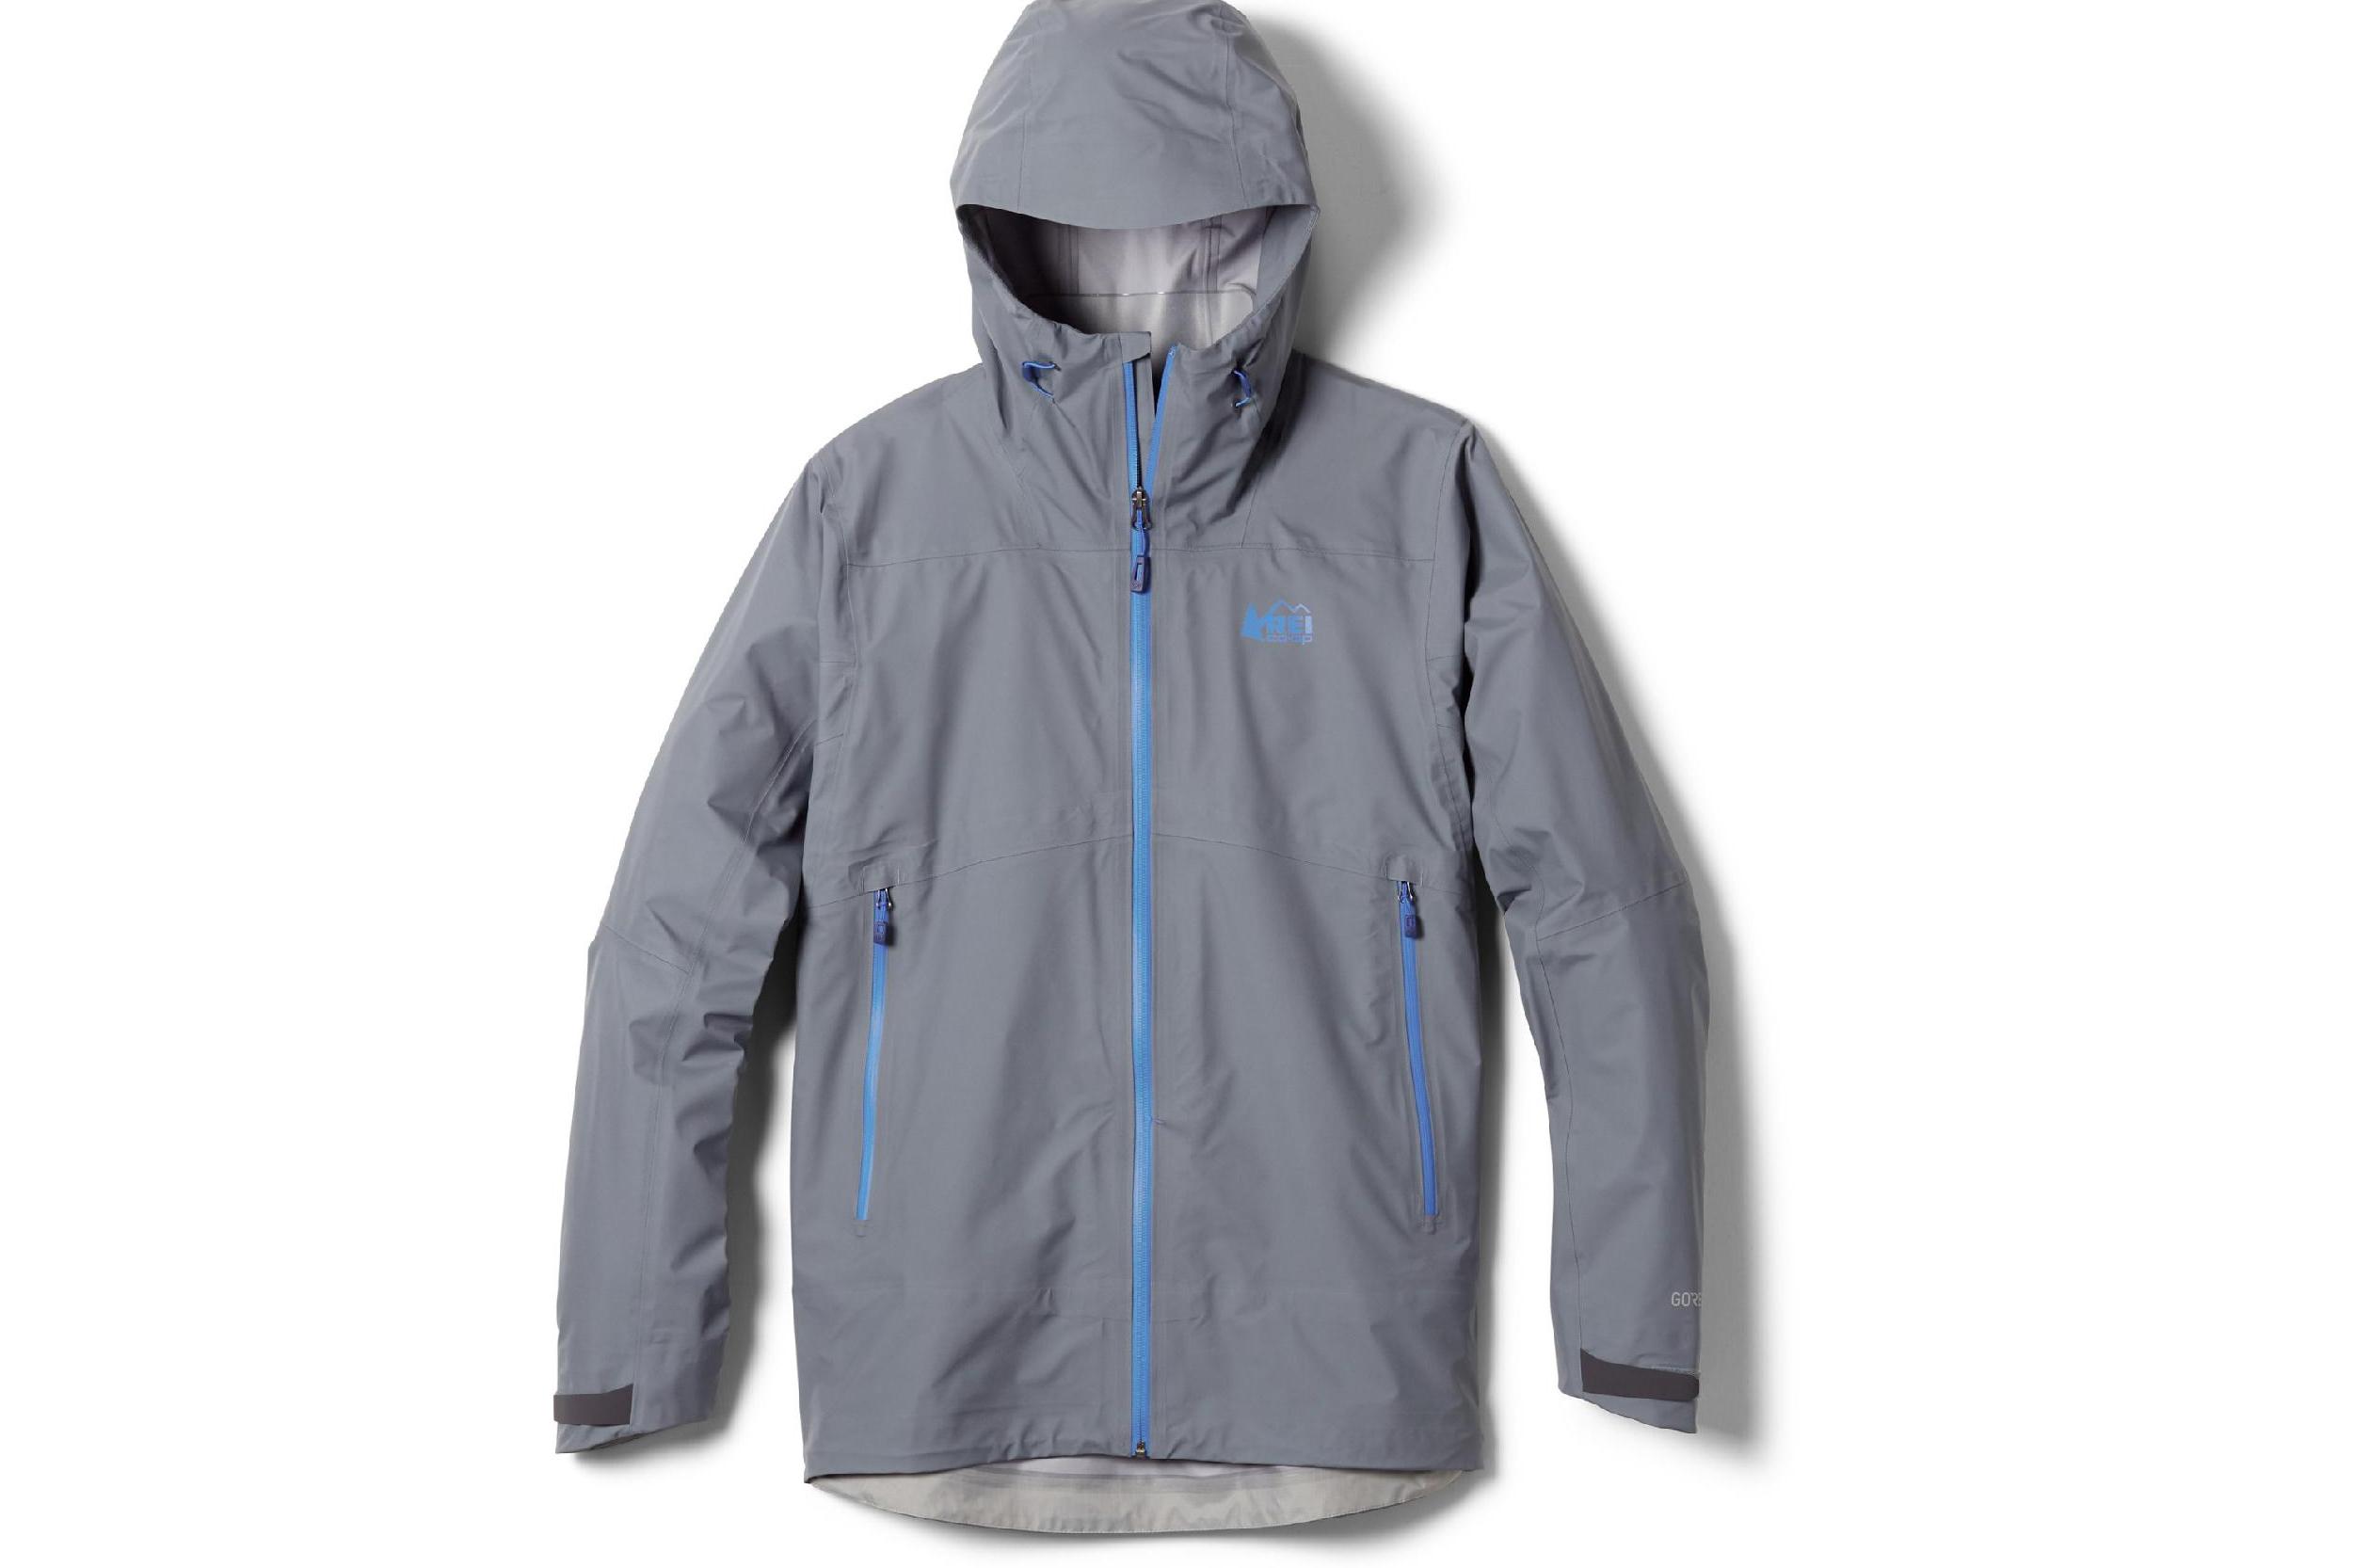 REI DryPoint GTX rain jacket